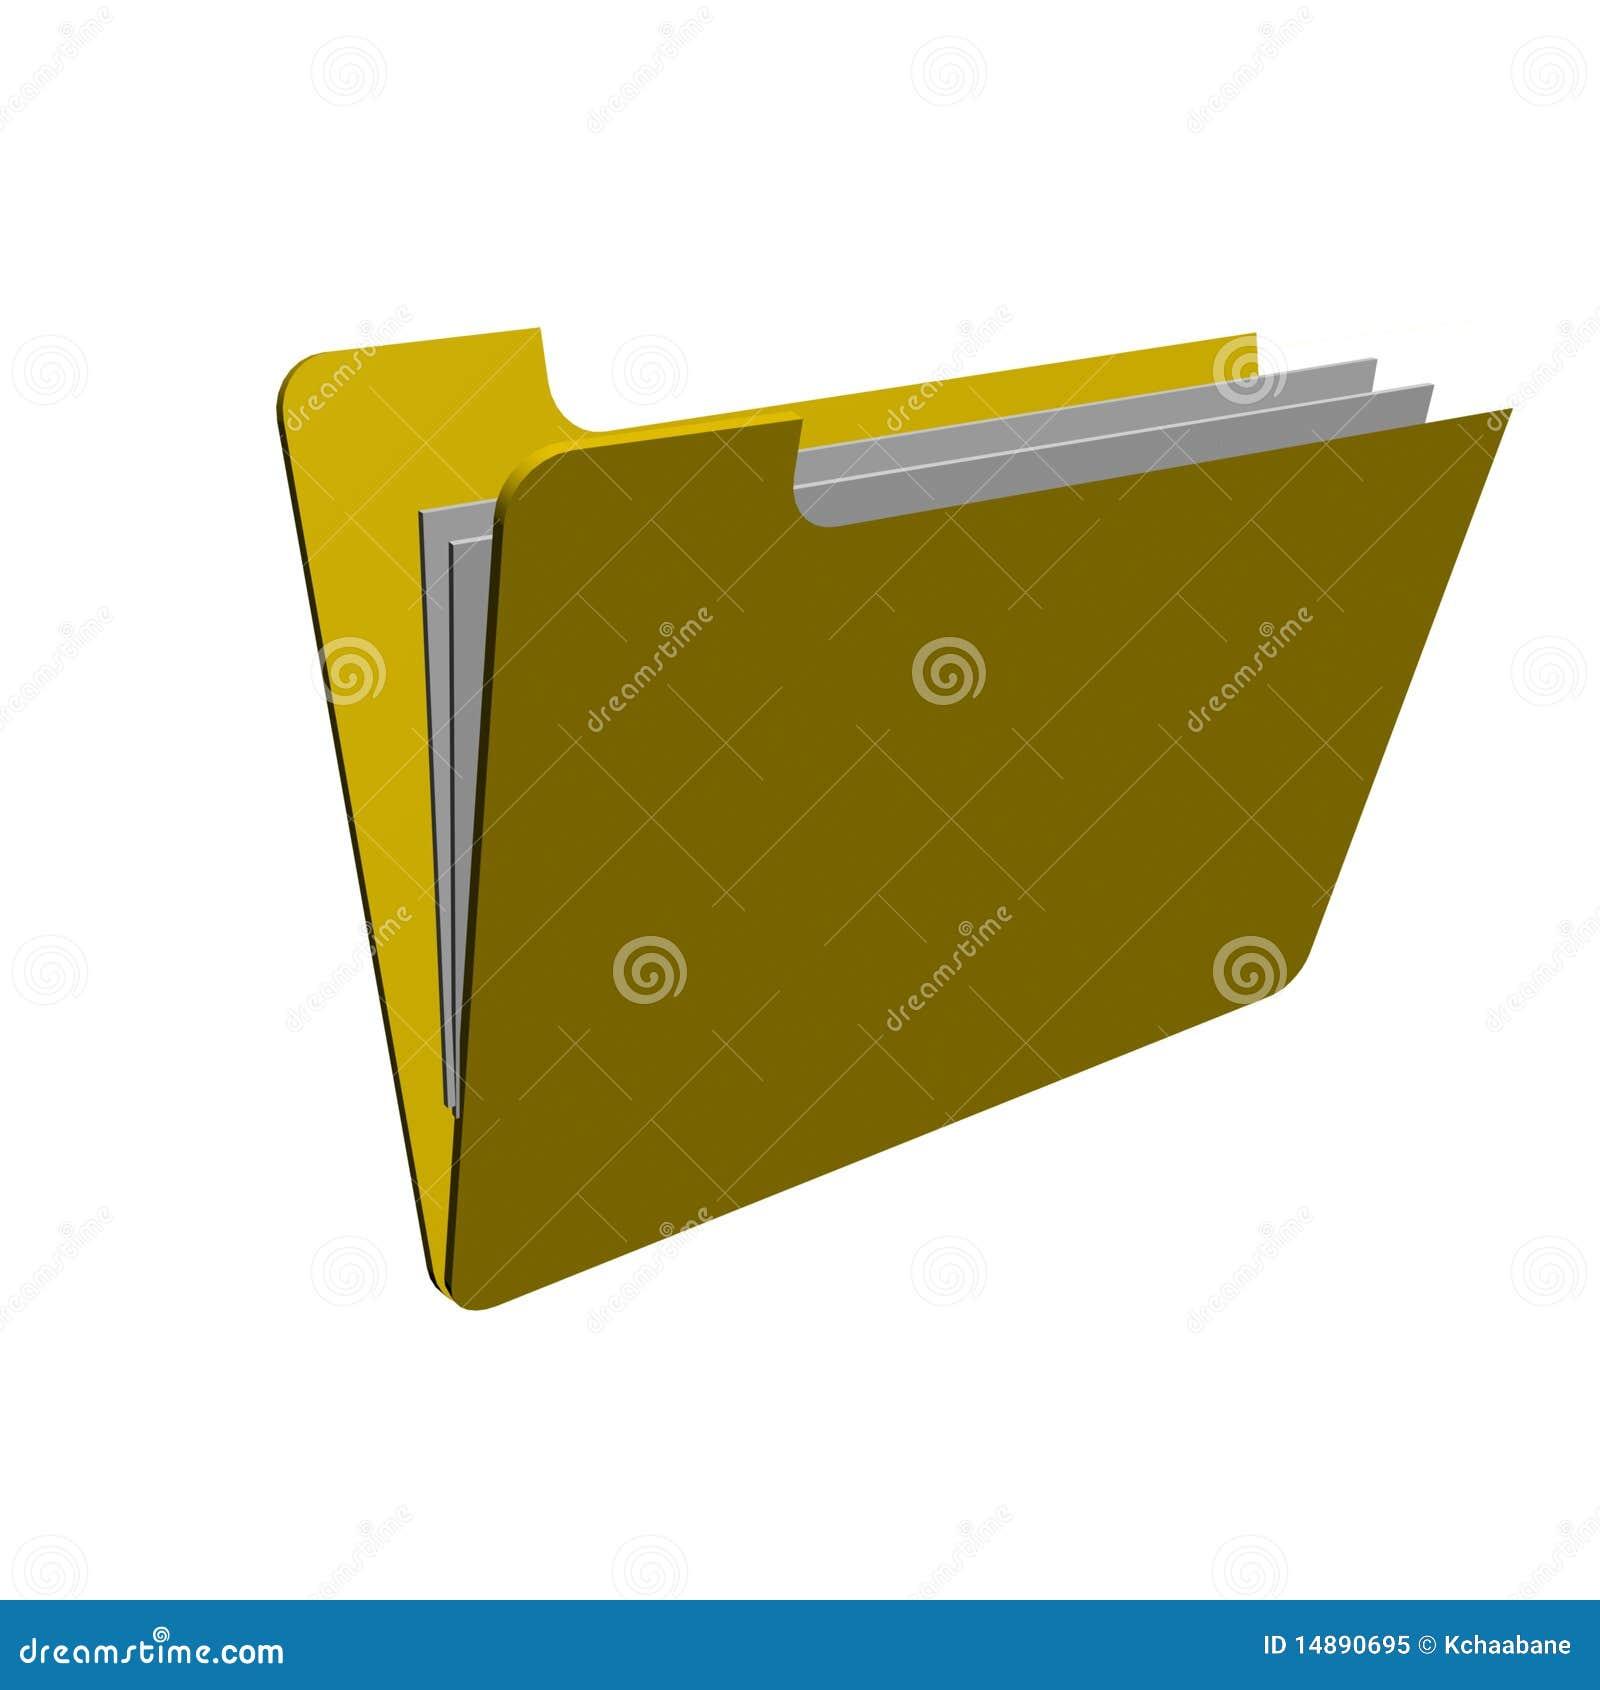 4sharedcom free file sharing and storage autos post